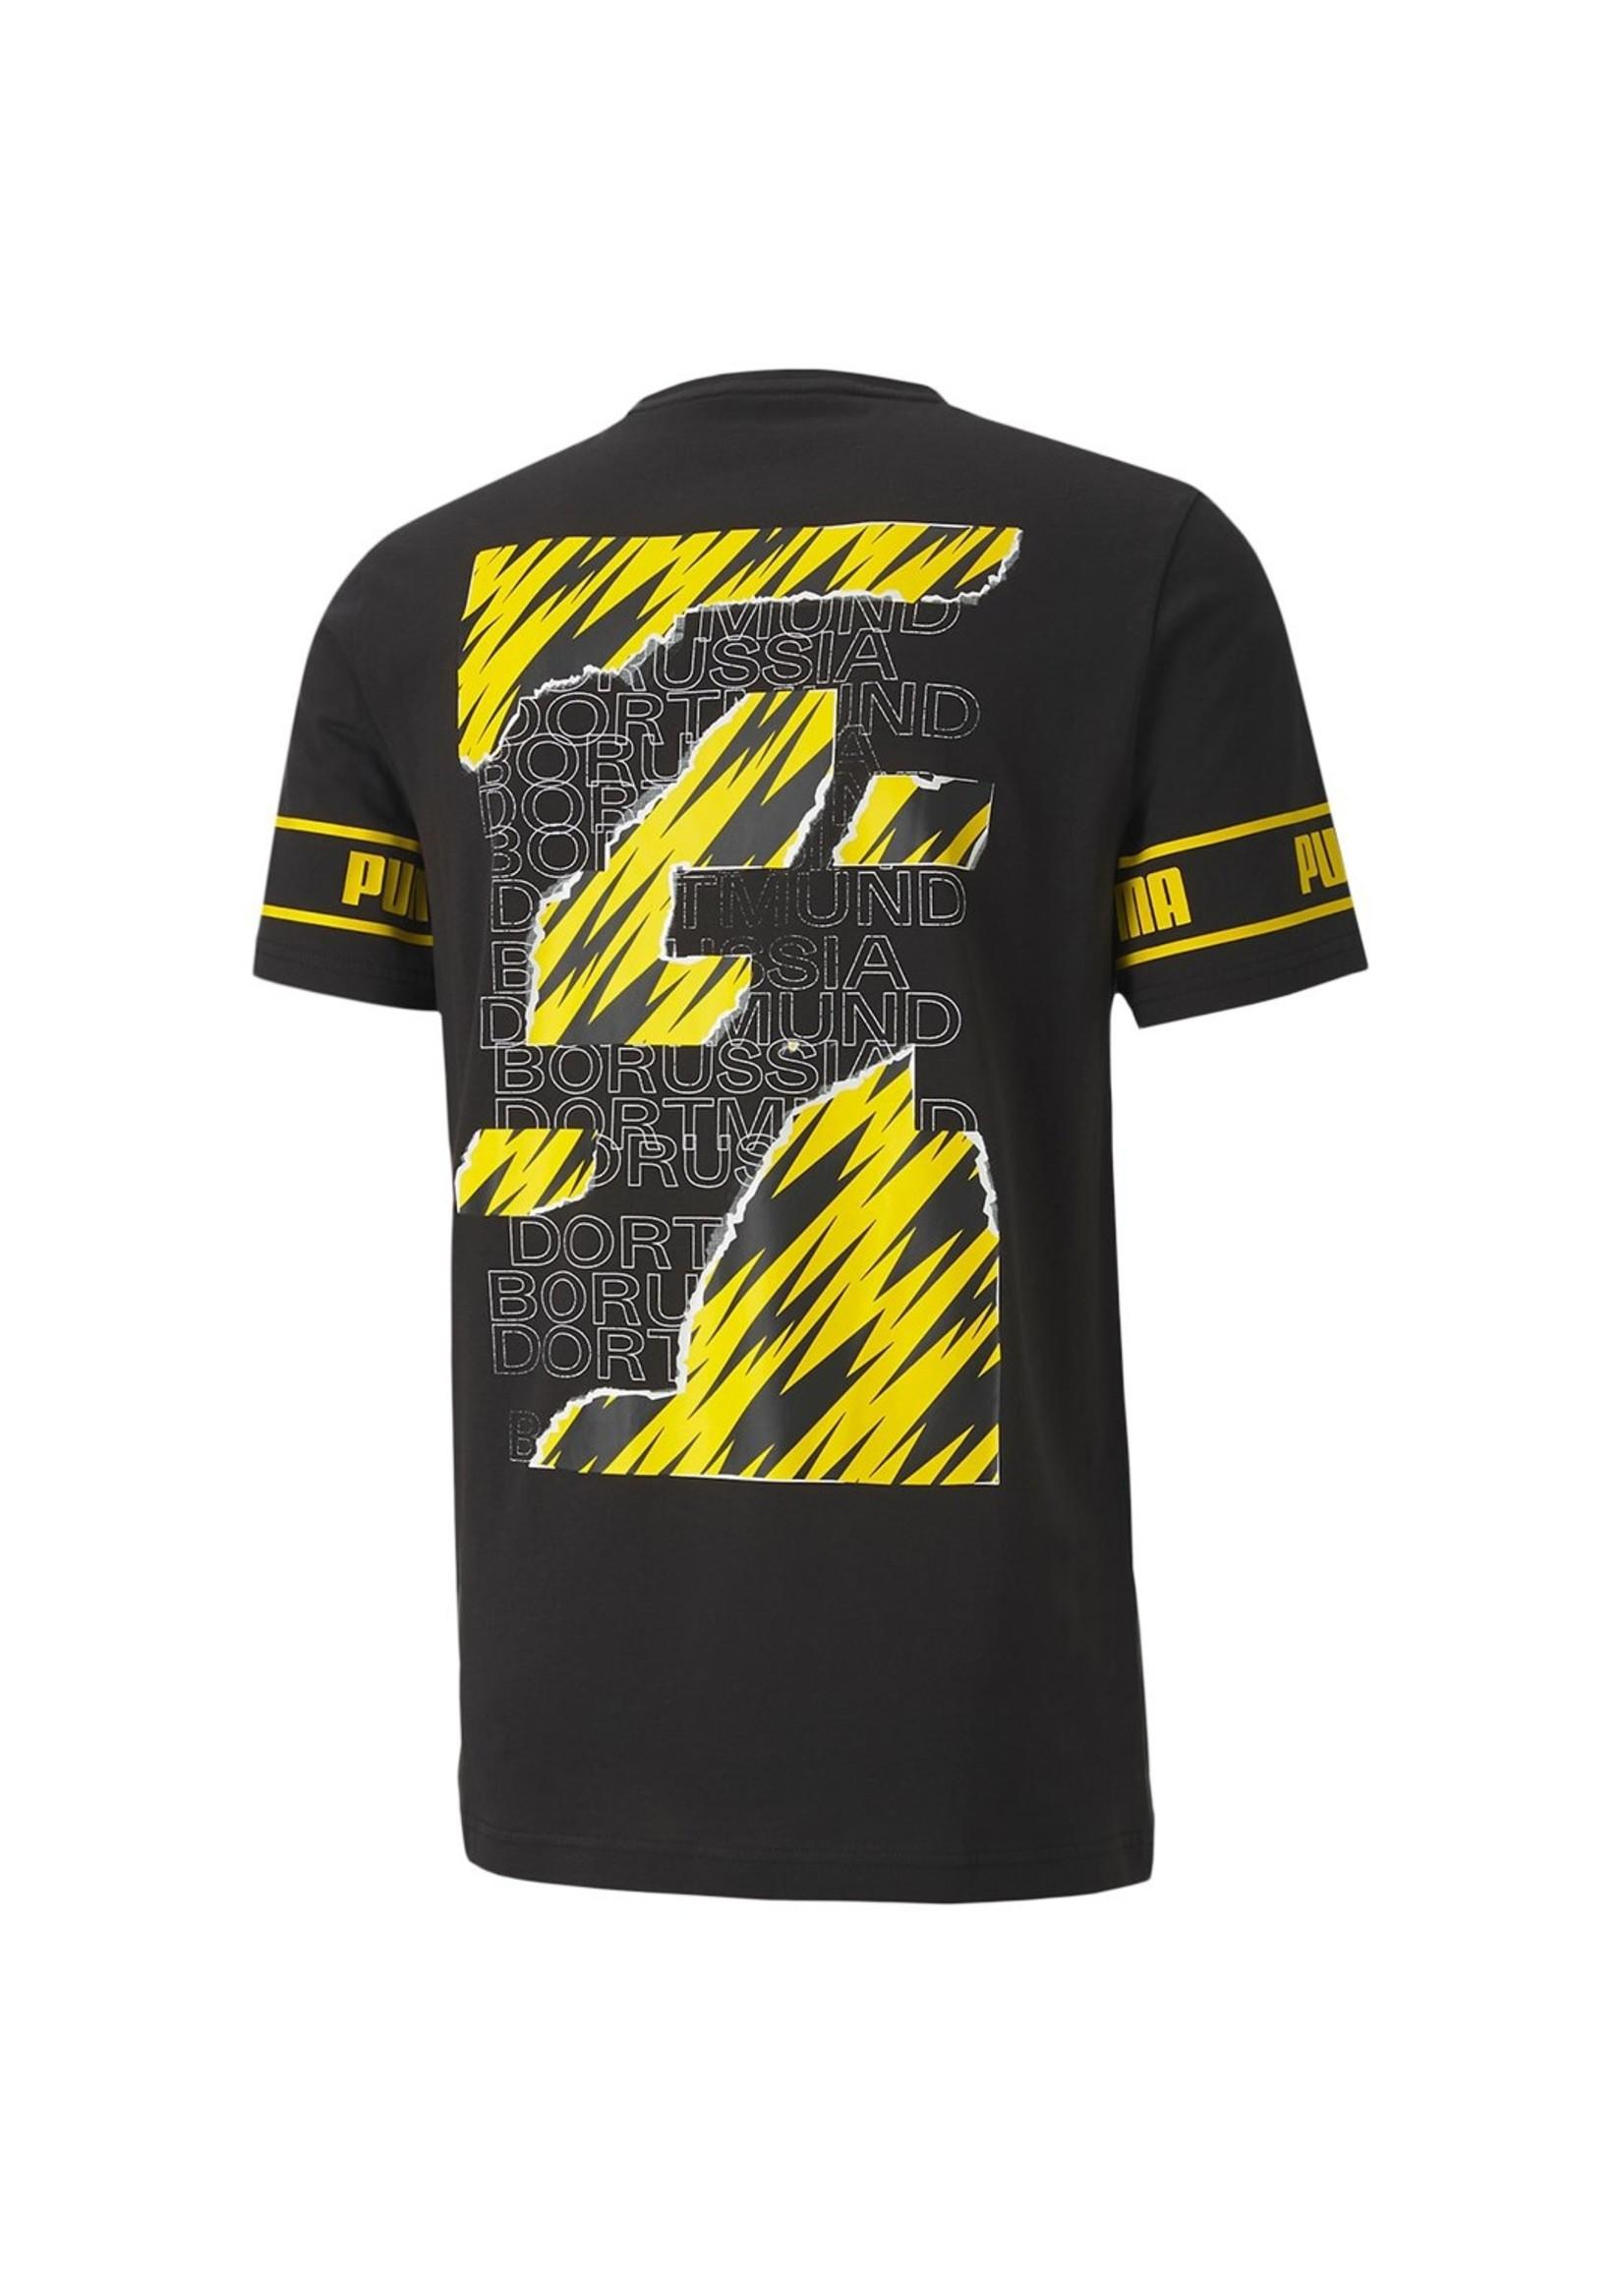 Puma Borussia Dortmund T-Shirt - 20/21 Away